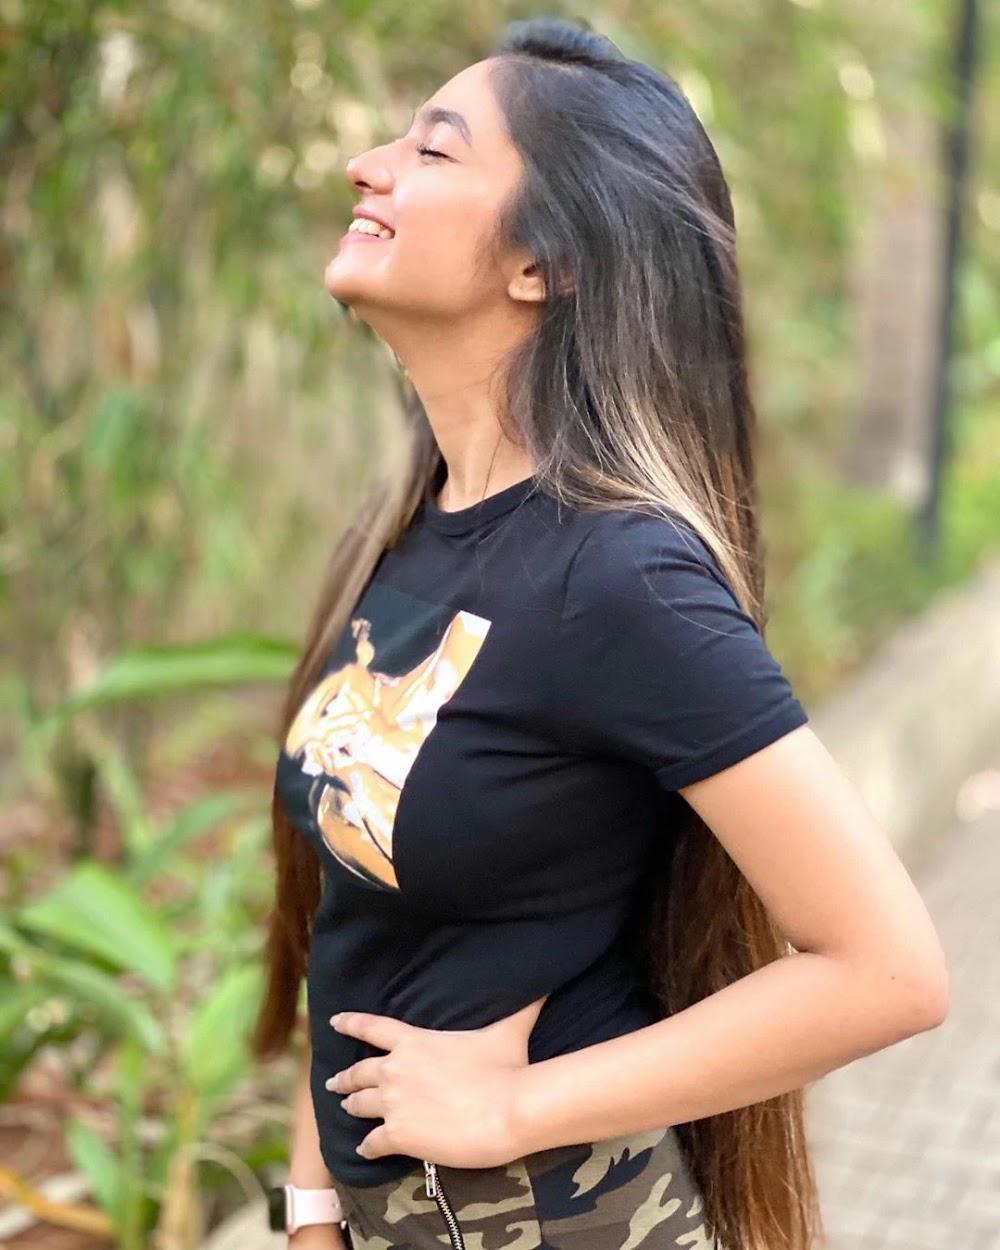 Anushka-Sen-side-look-HD-photo-getpics